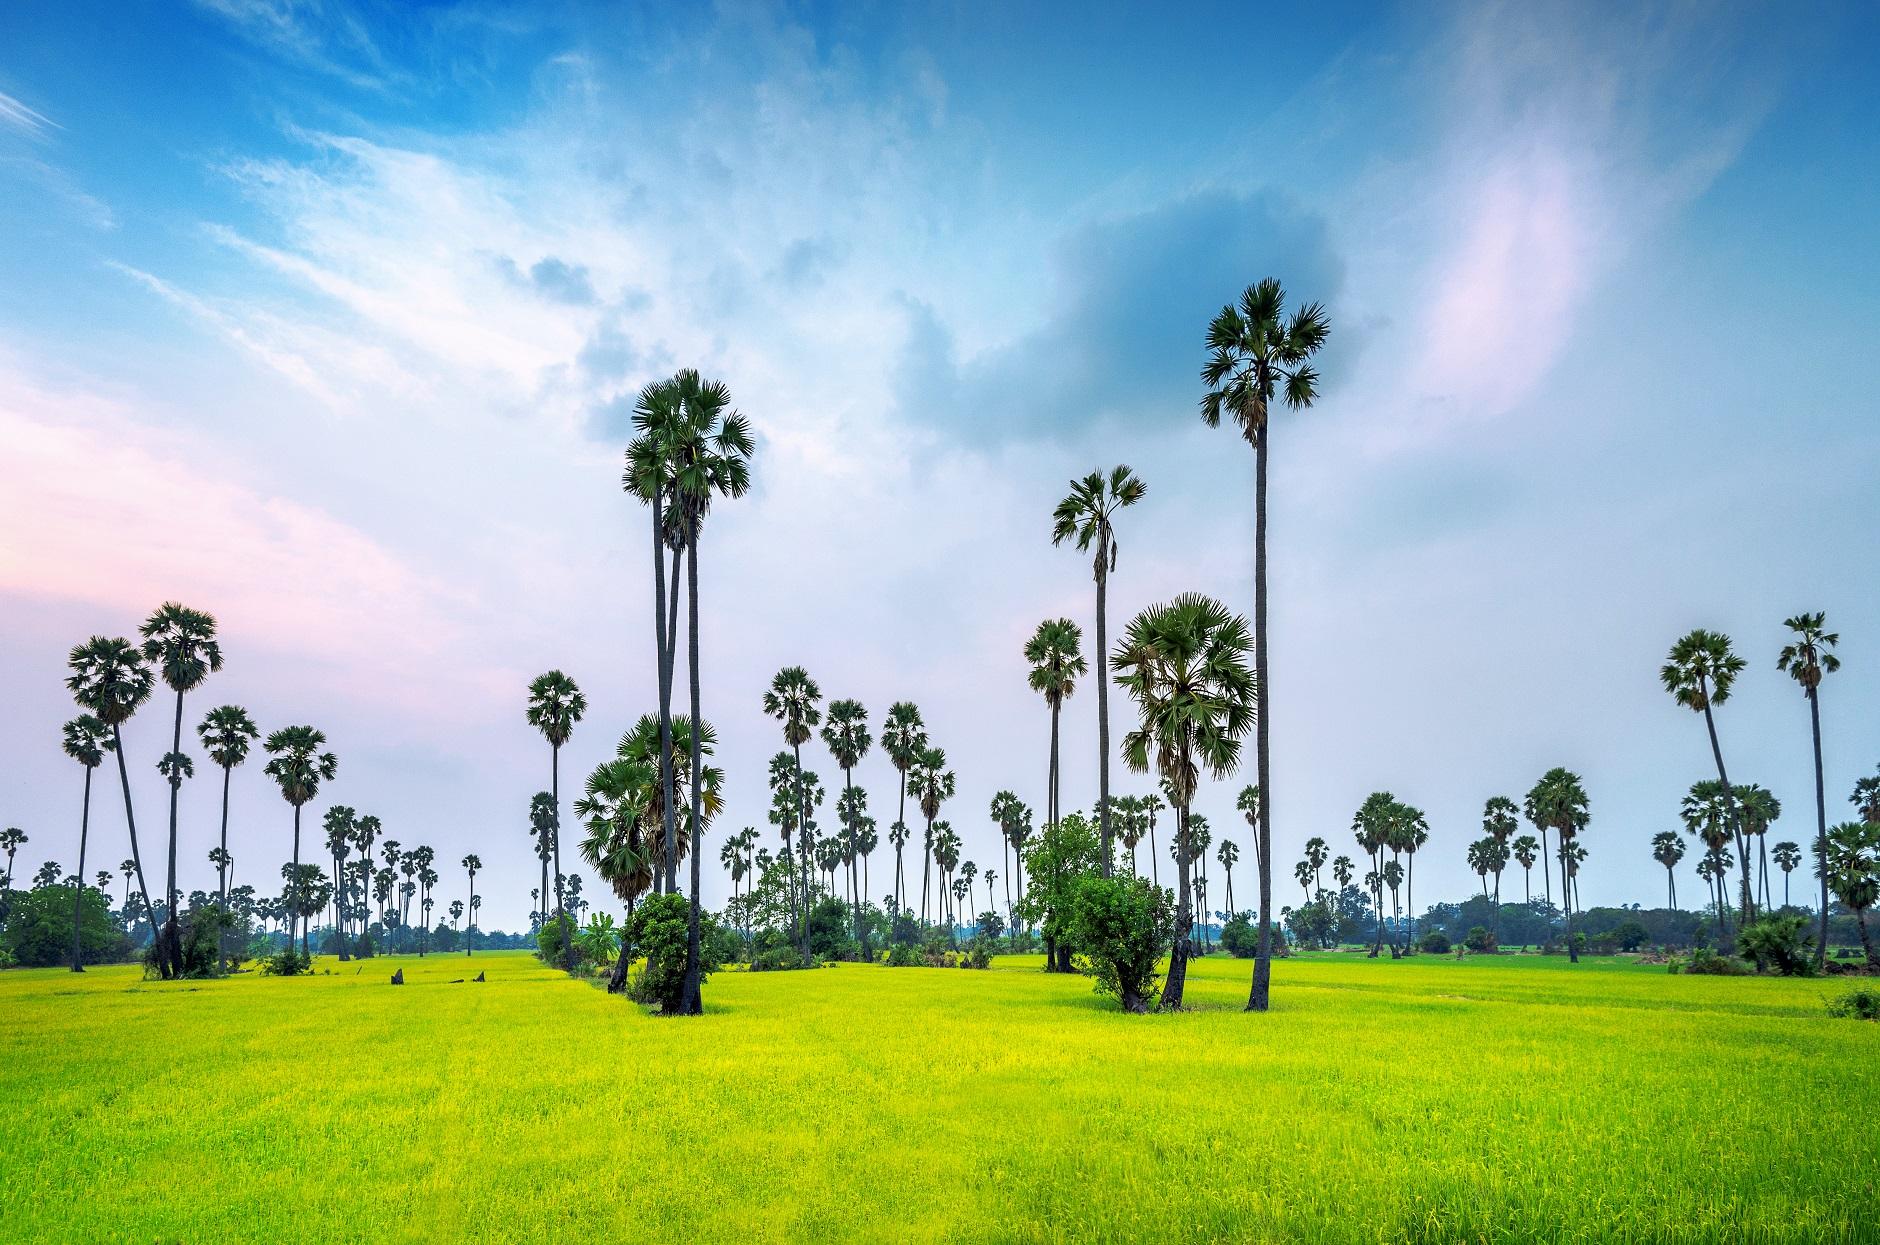 Rice import across the globe